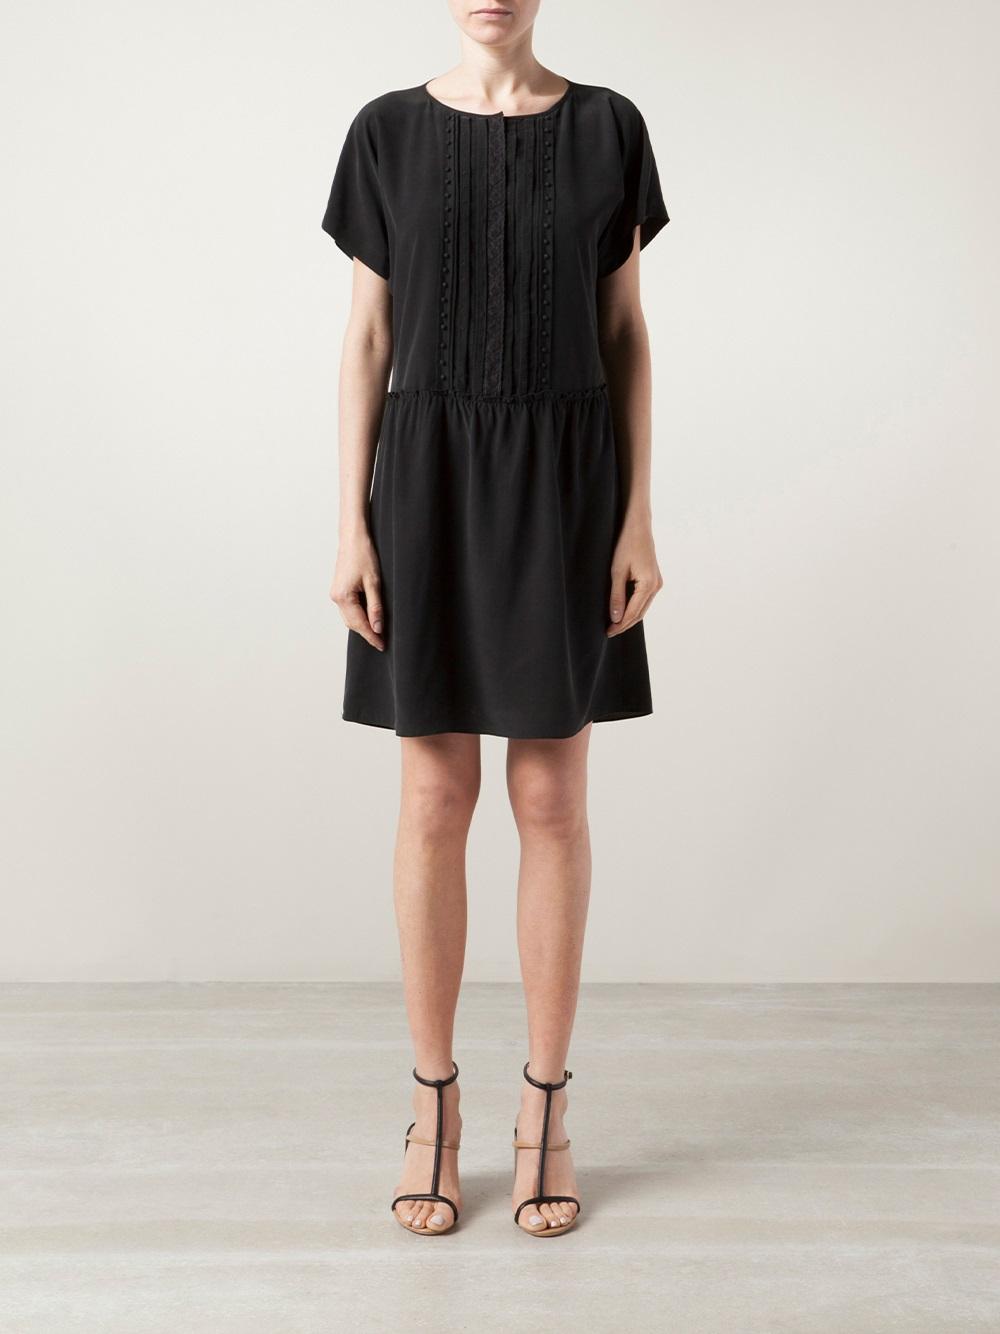 lyst vanessa bruno ath robe dress in black. Black Bedroom Furniture Sets. Home Design Ideas